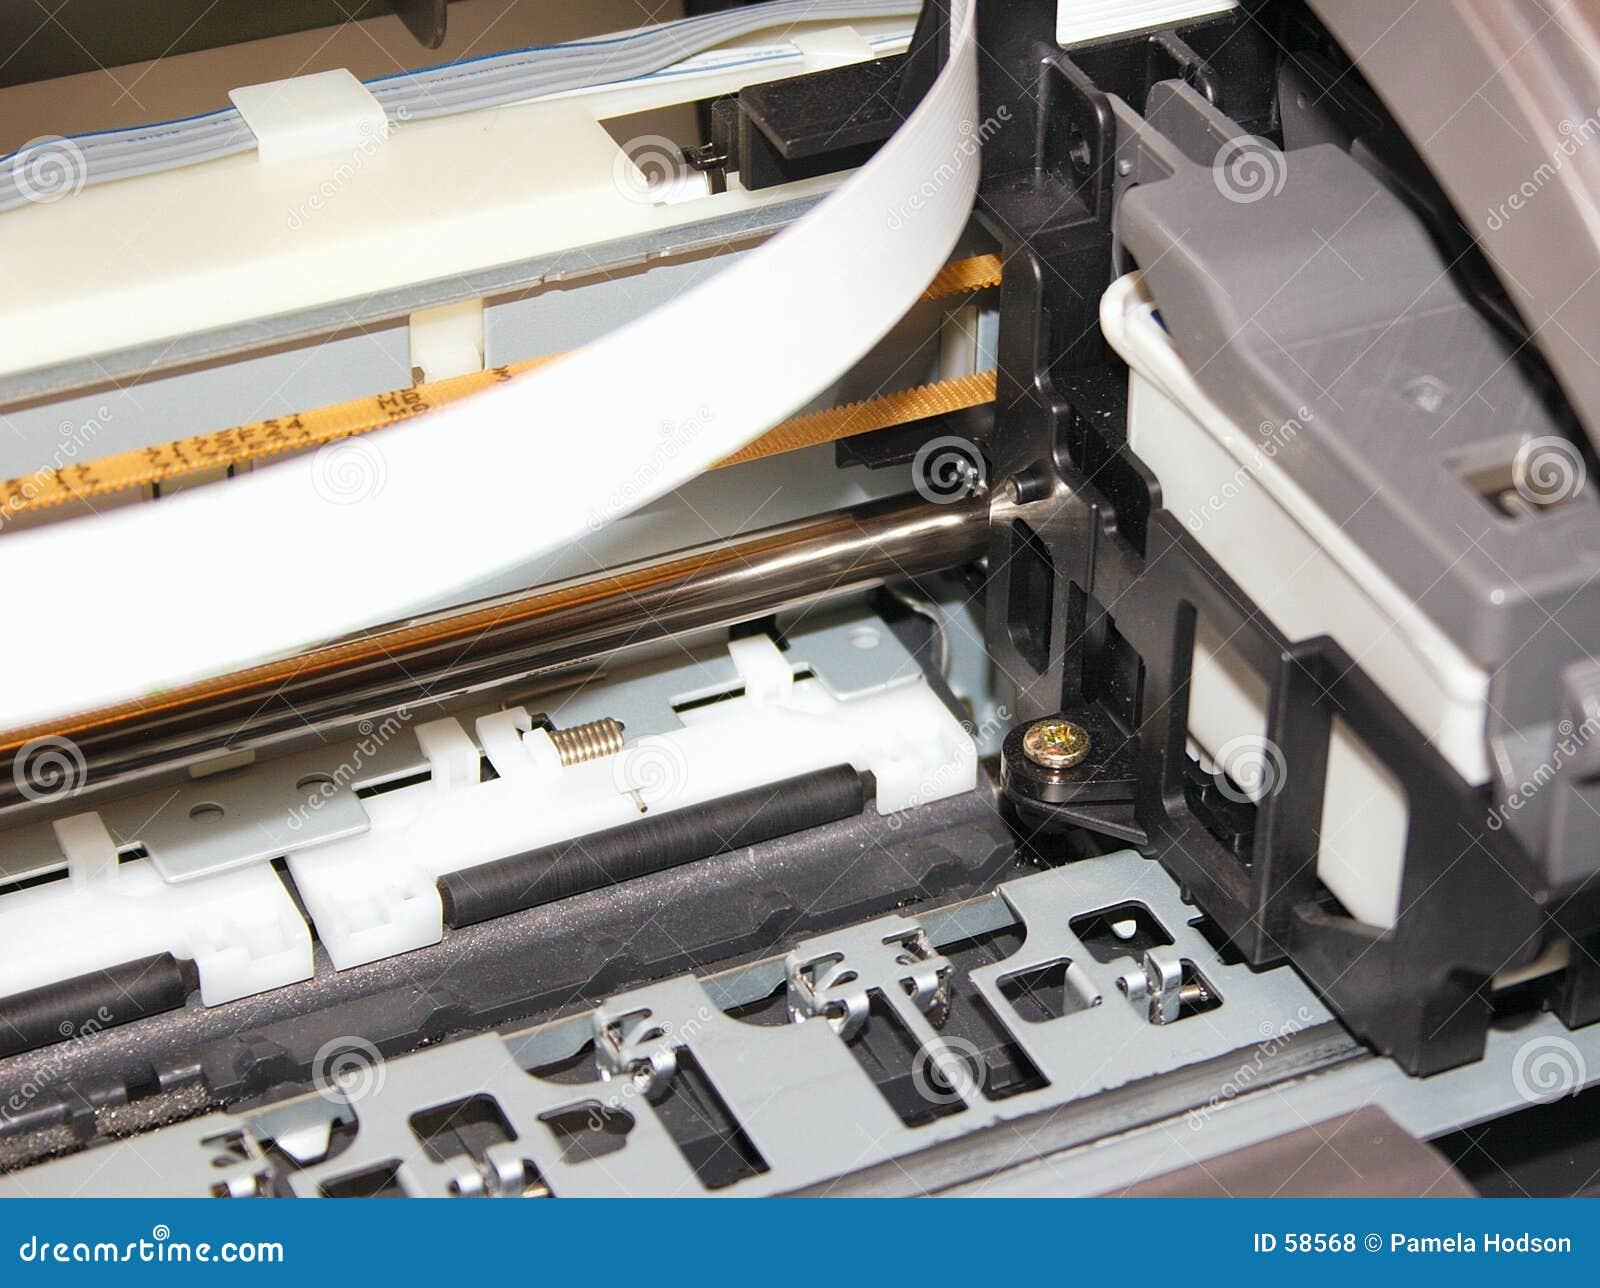 Download εκτυπωτής στοκ εικόνες. εικόνα από μέταλλο, μεταφορά, brunelleschi - 58568